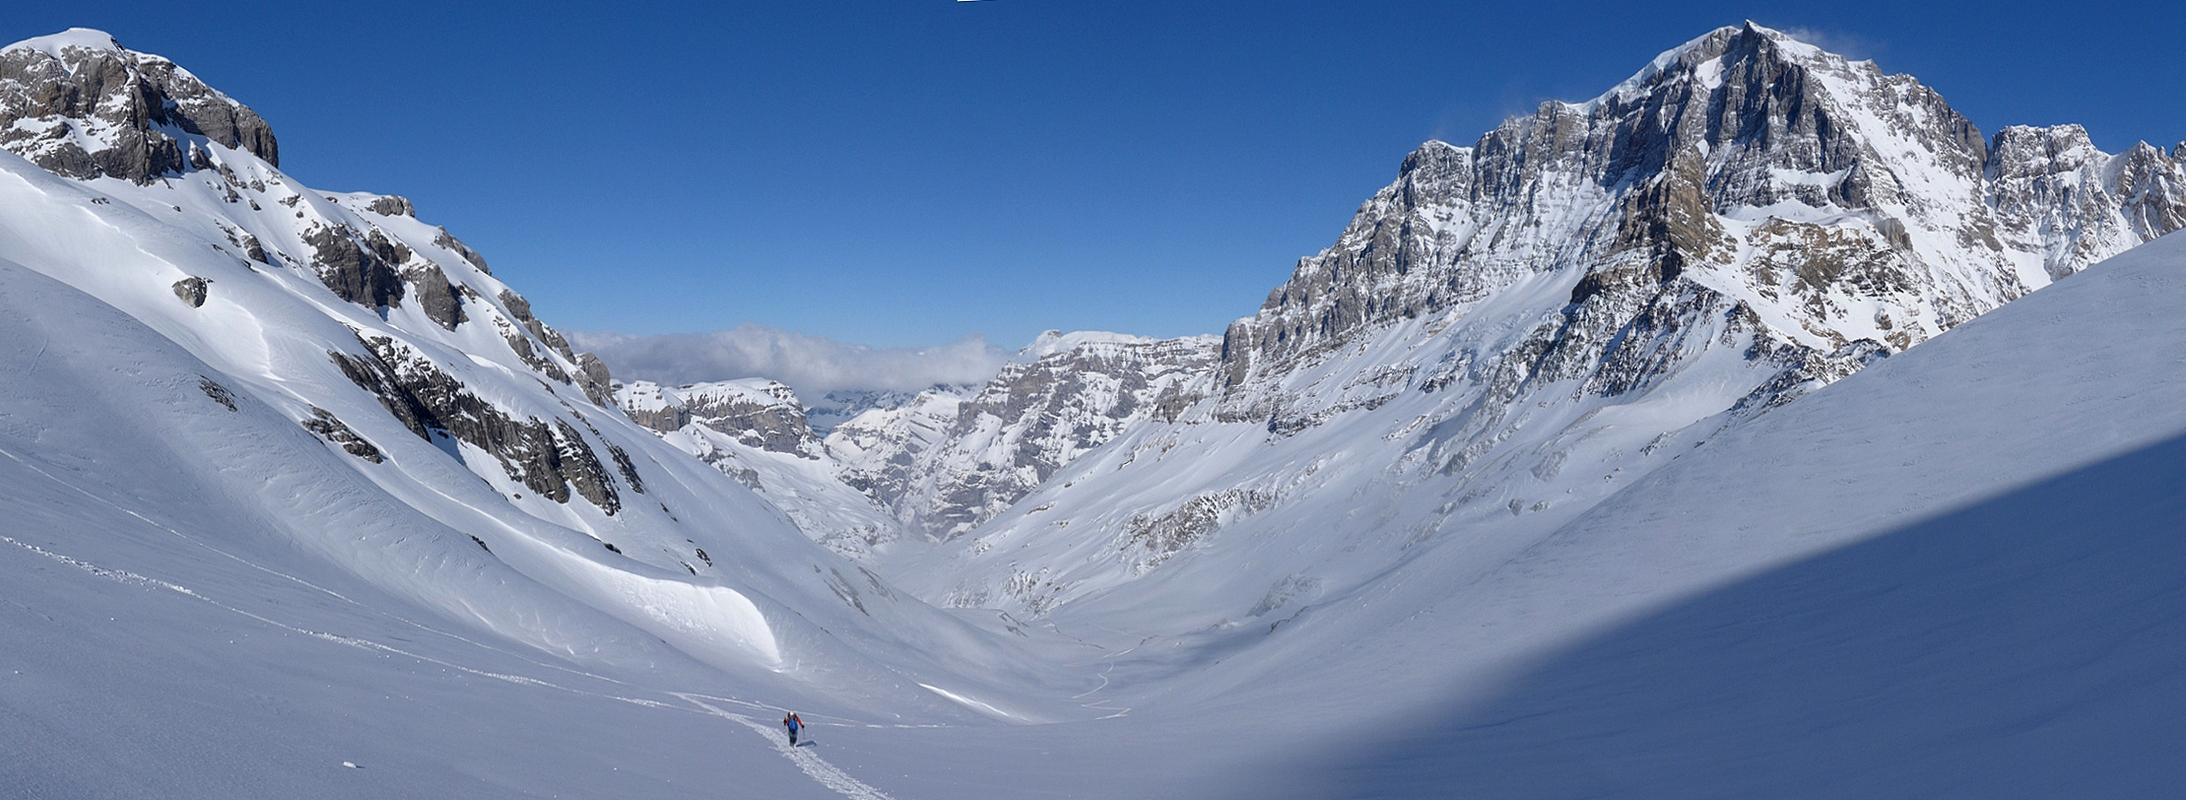 Planurahütte Glarner Alpen Schweiz panorama 42